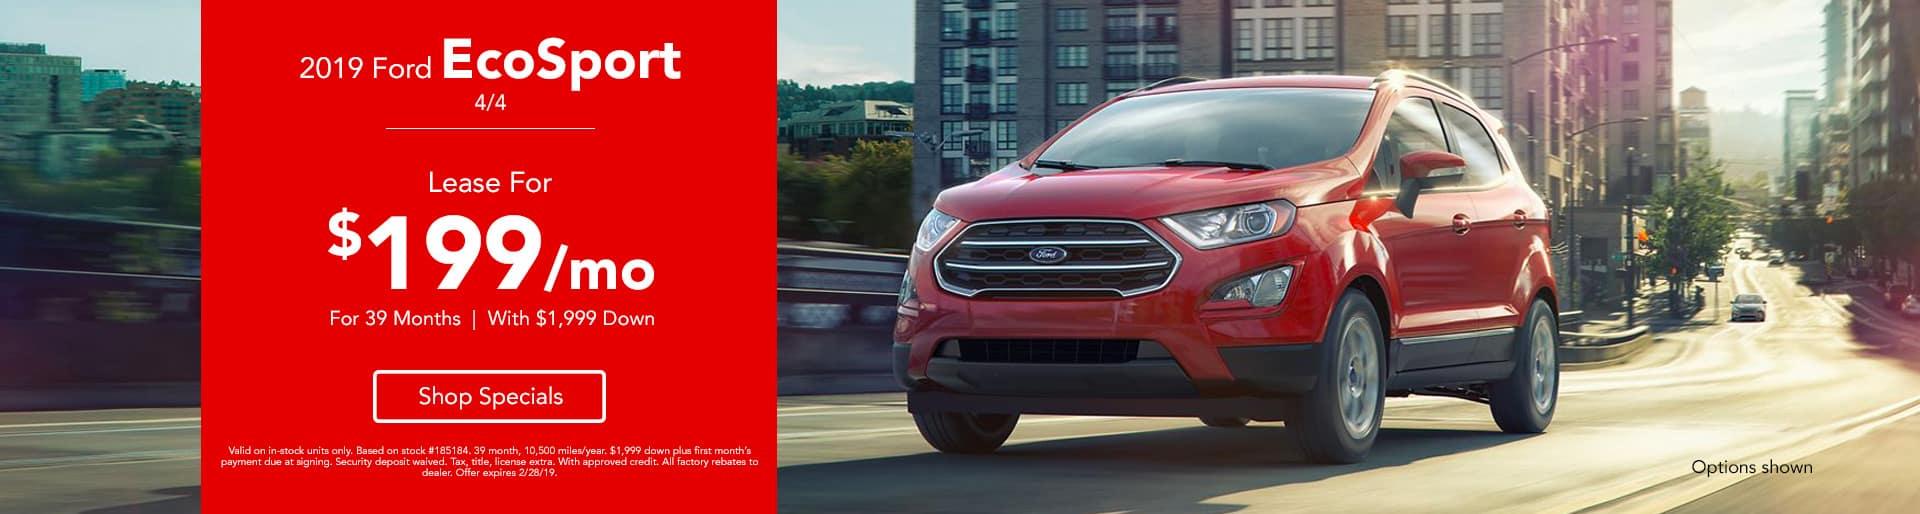 2019 Ford EcoSport 4/4